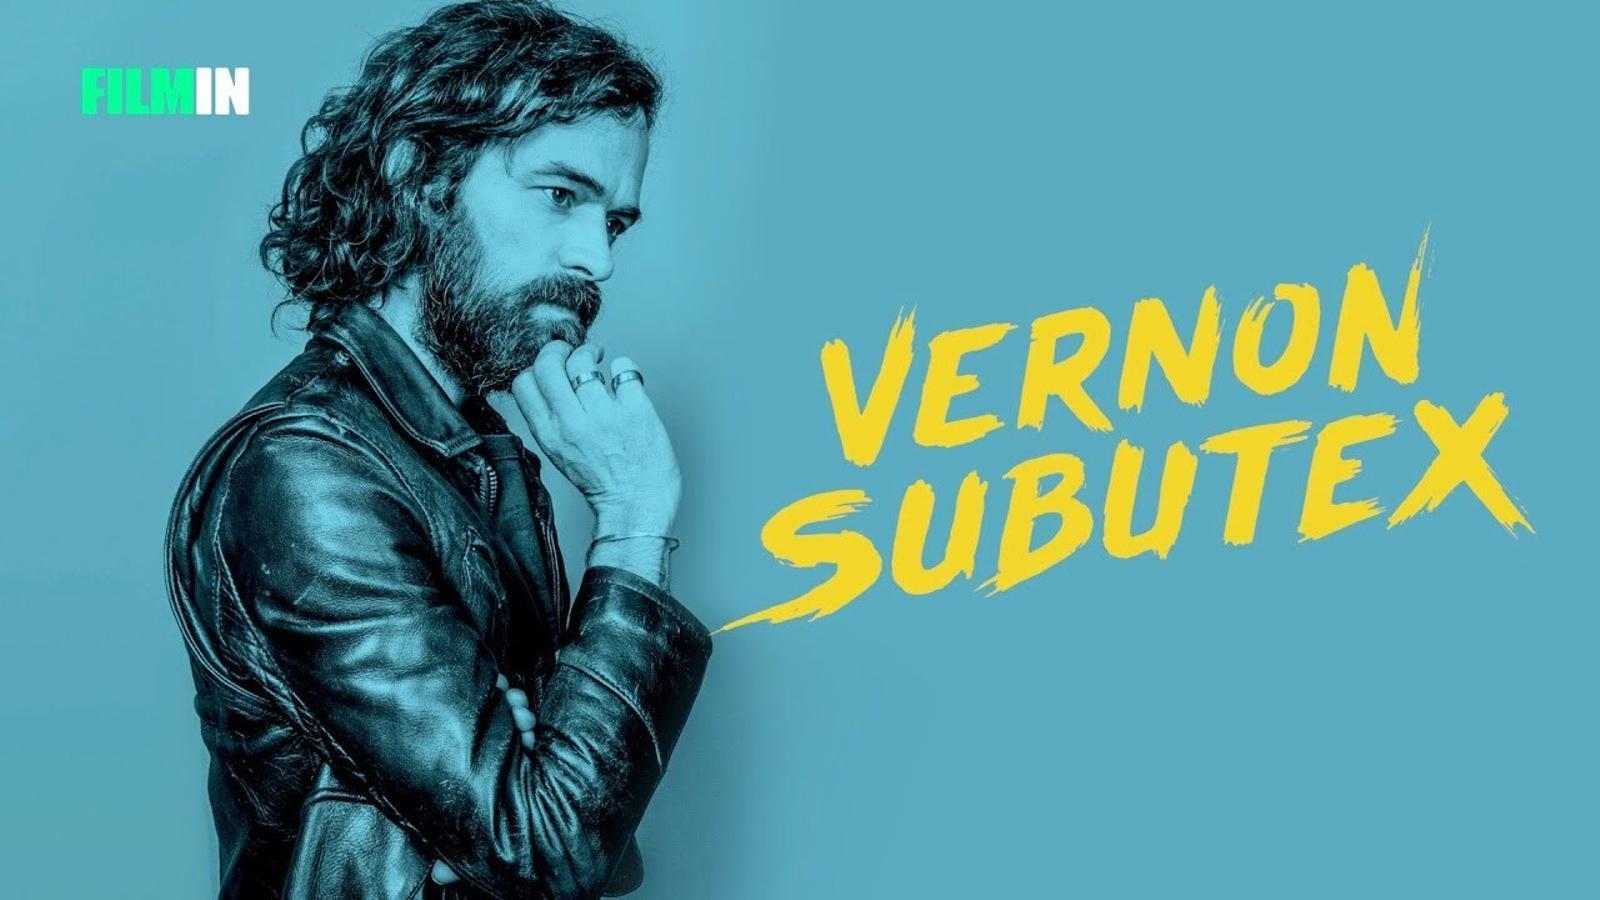 'Vernon Subutex', tràiler